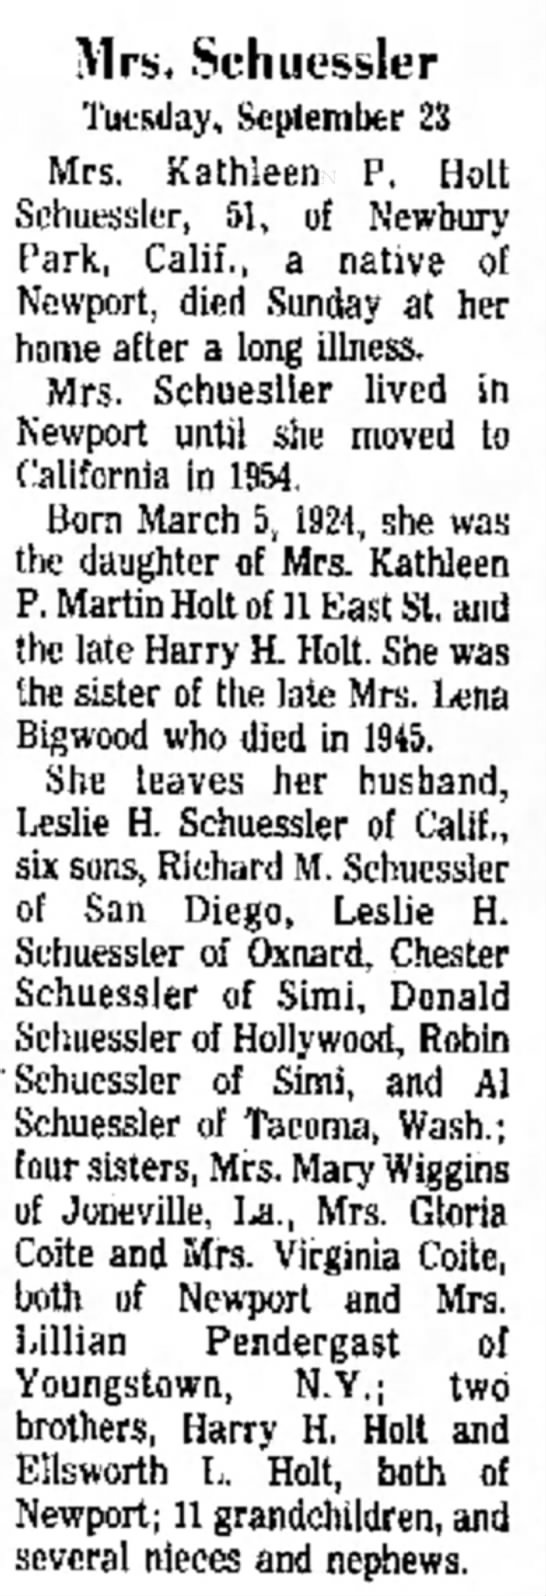 Kathleen Patricia Schuessler26 Sep 1975 Newport Mercury - for Art to M e d i c a l 65, Mrs. Schucssler...